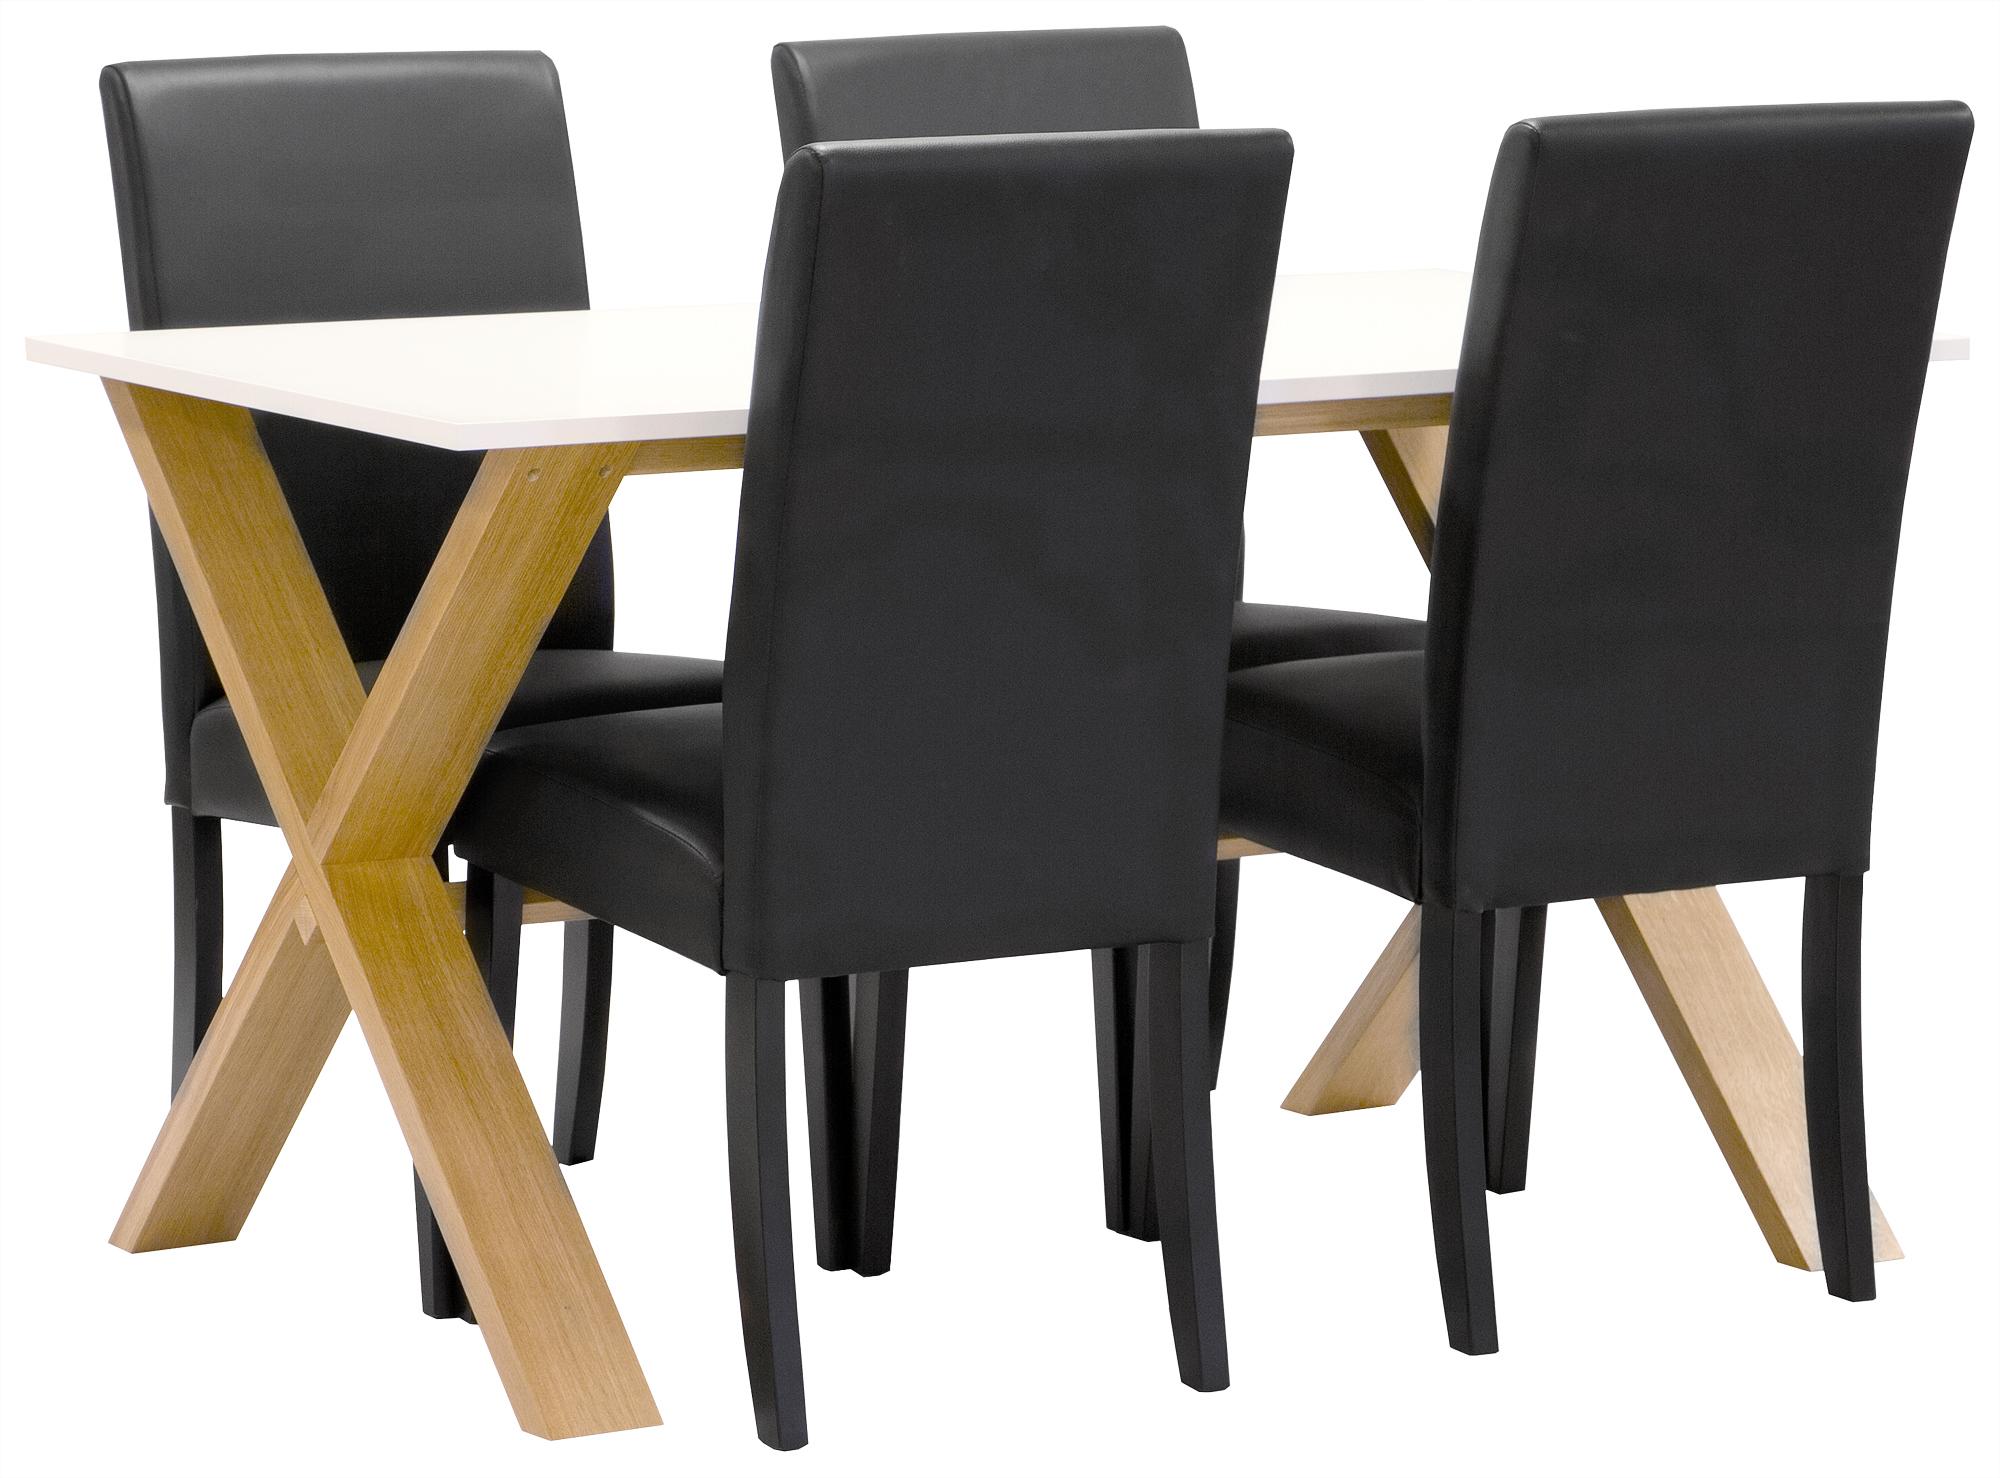 Matgrupp NordiForm Artic matbord 140 ek vit + 4 st Mazzin svart svart 5395 kr Trendrum se